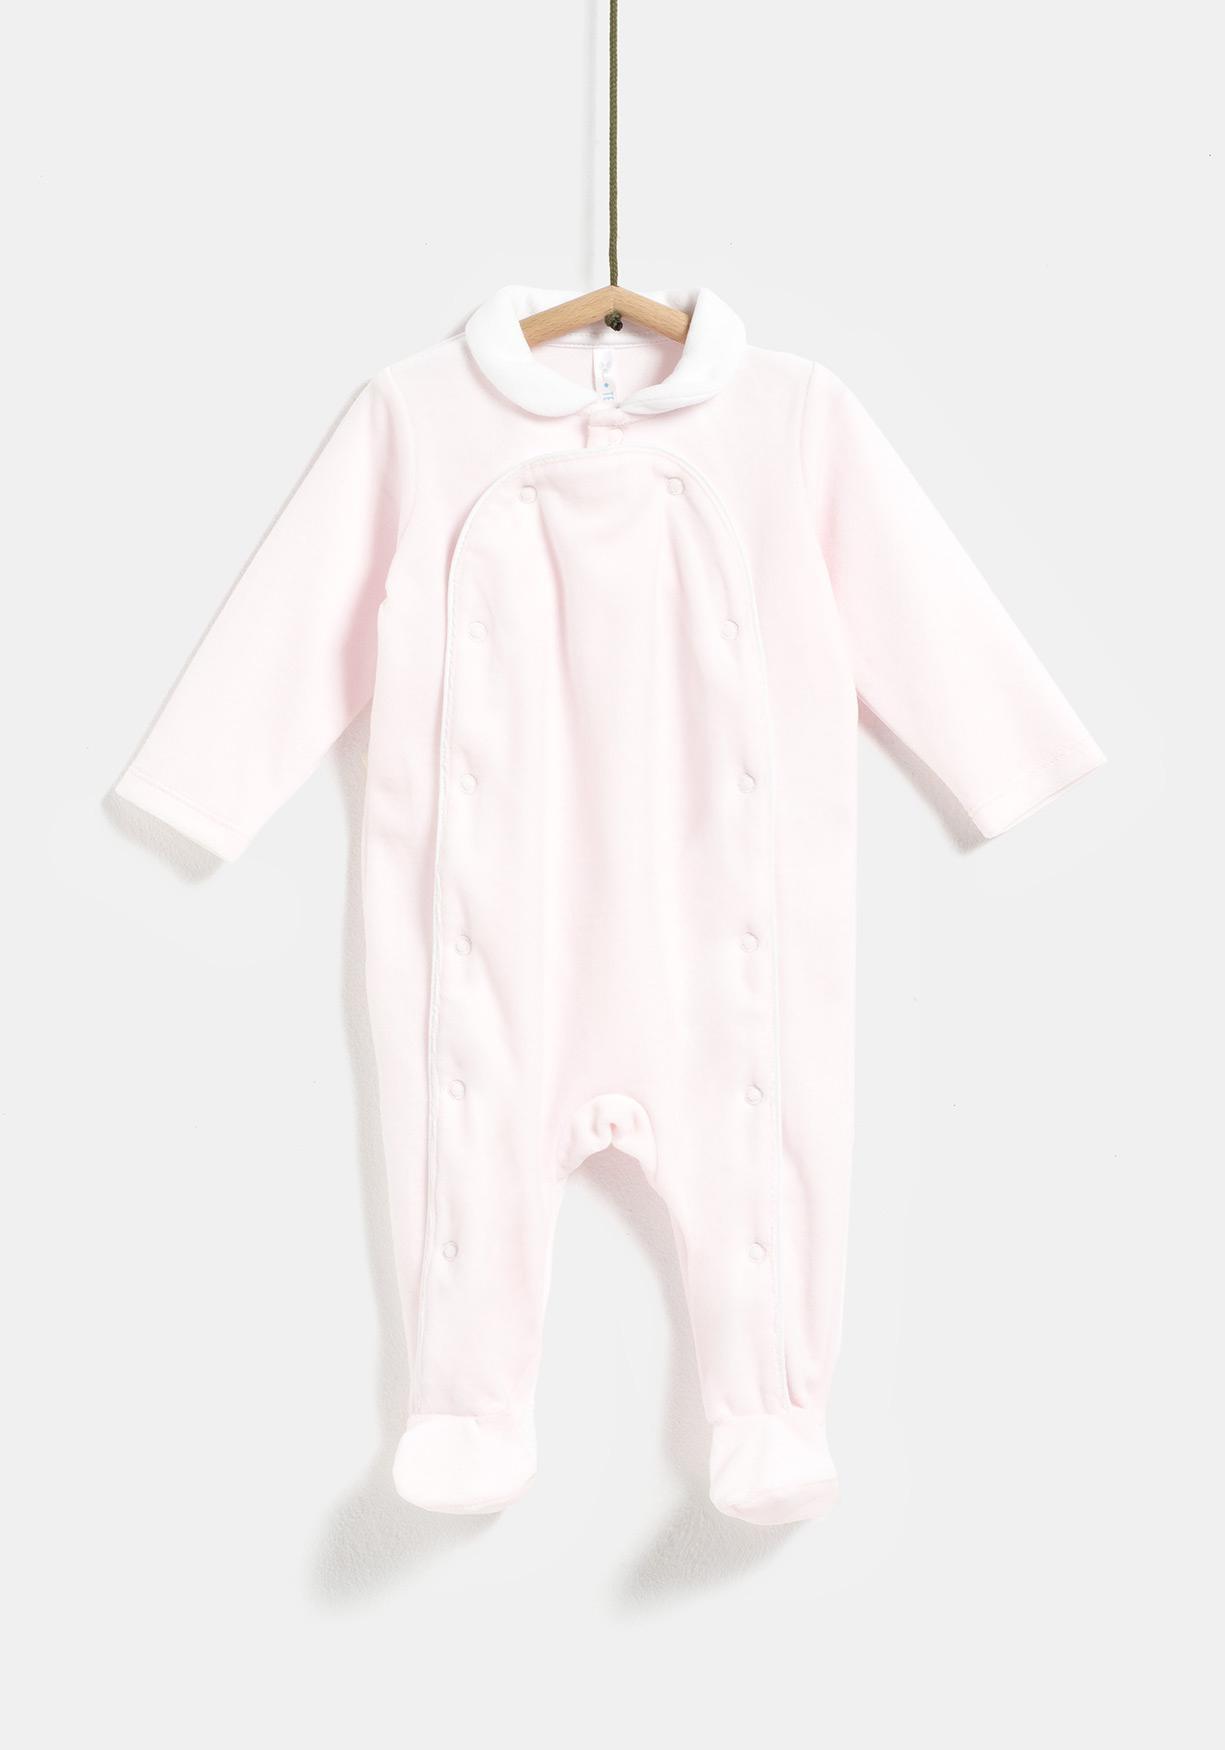 fd2499040 Comprar Pijama para recién nacido unisex TEX. ¡Aprovéchate de ...